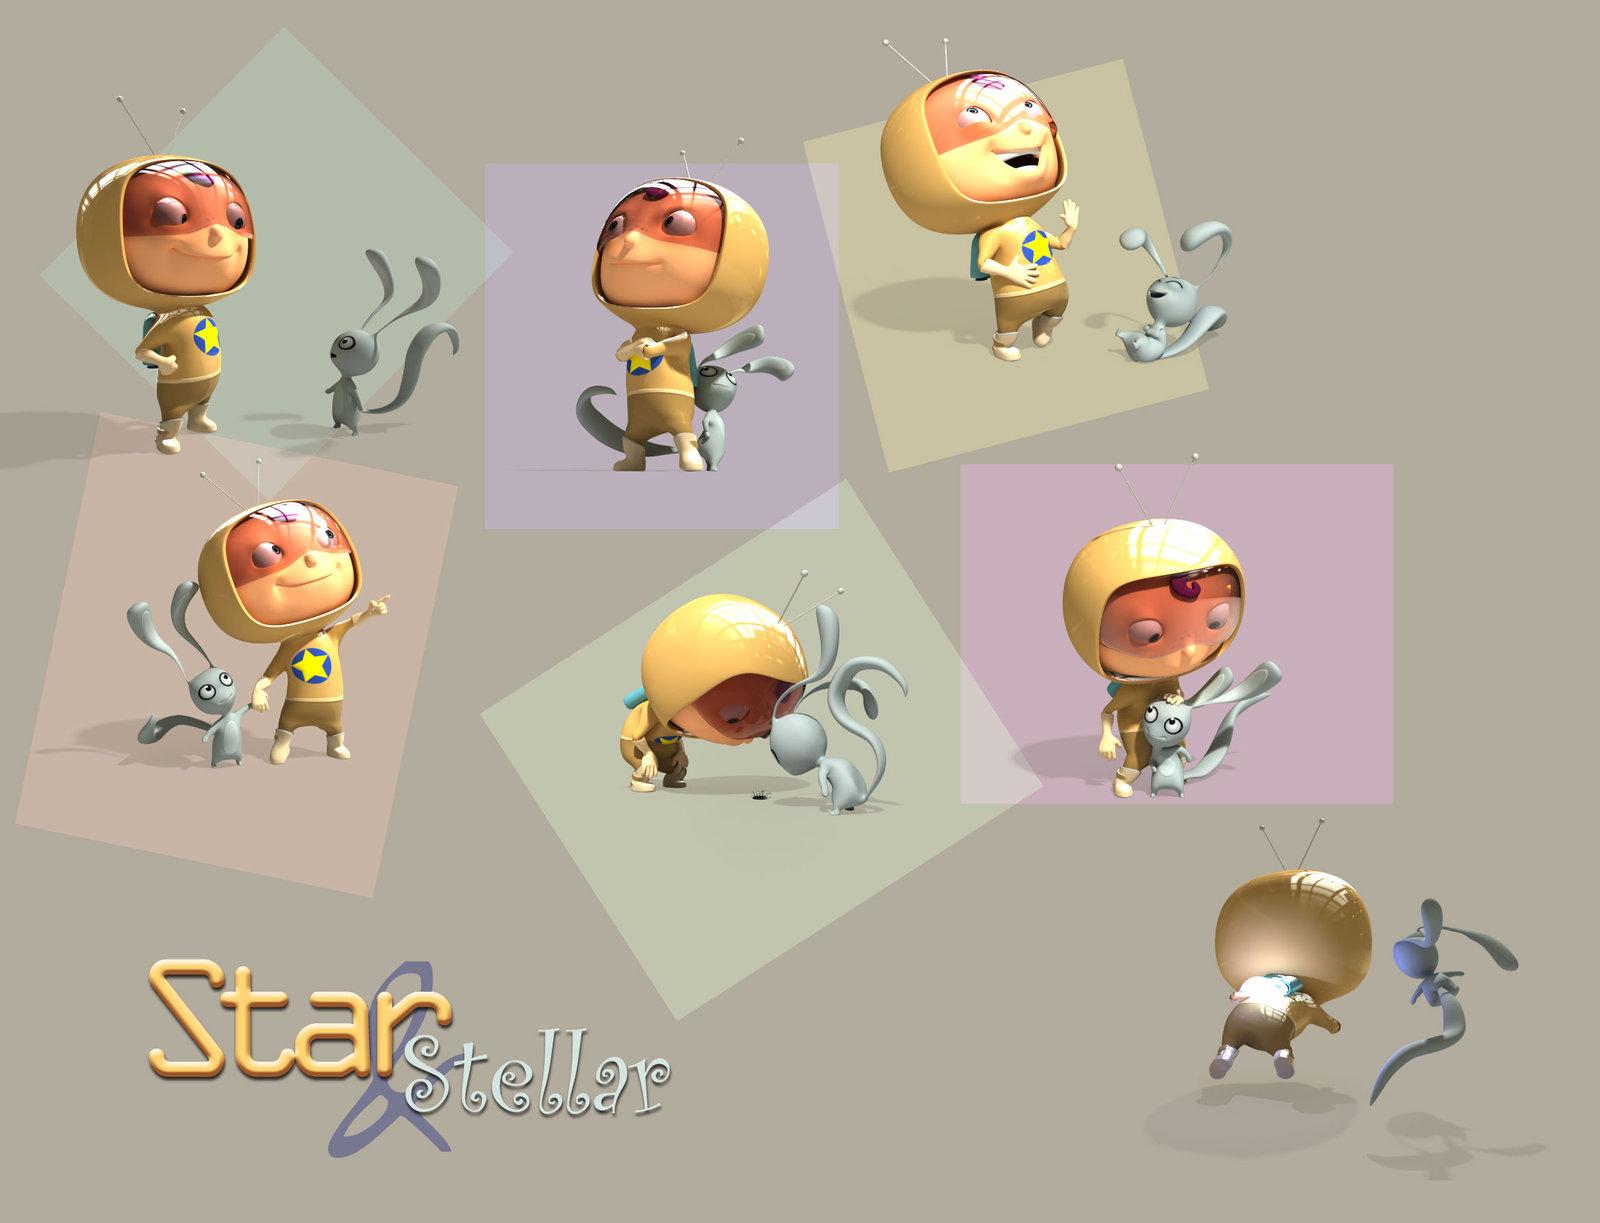 Star and Stellar